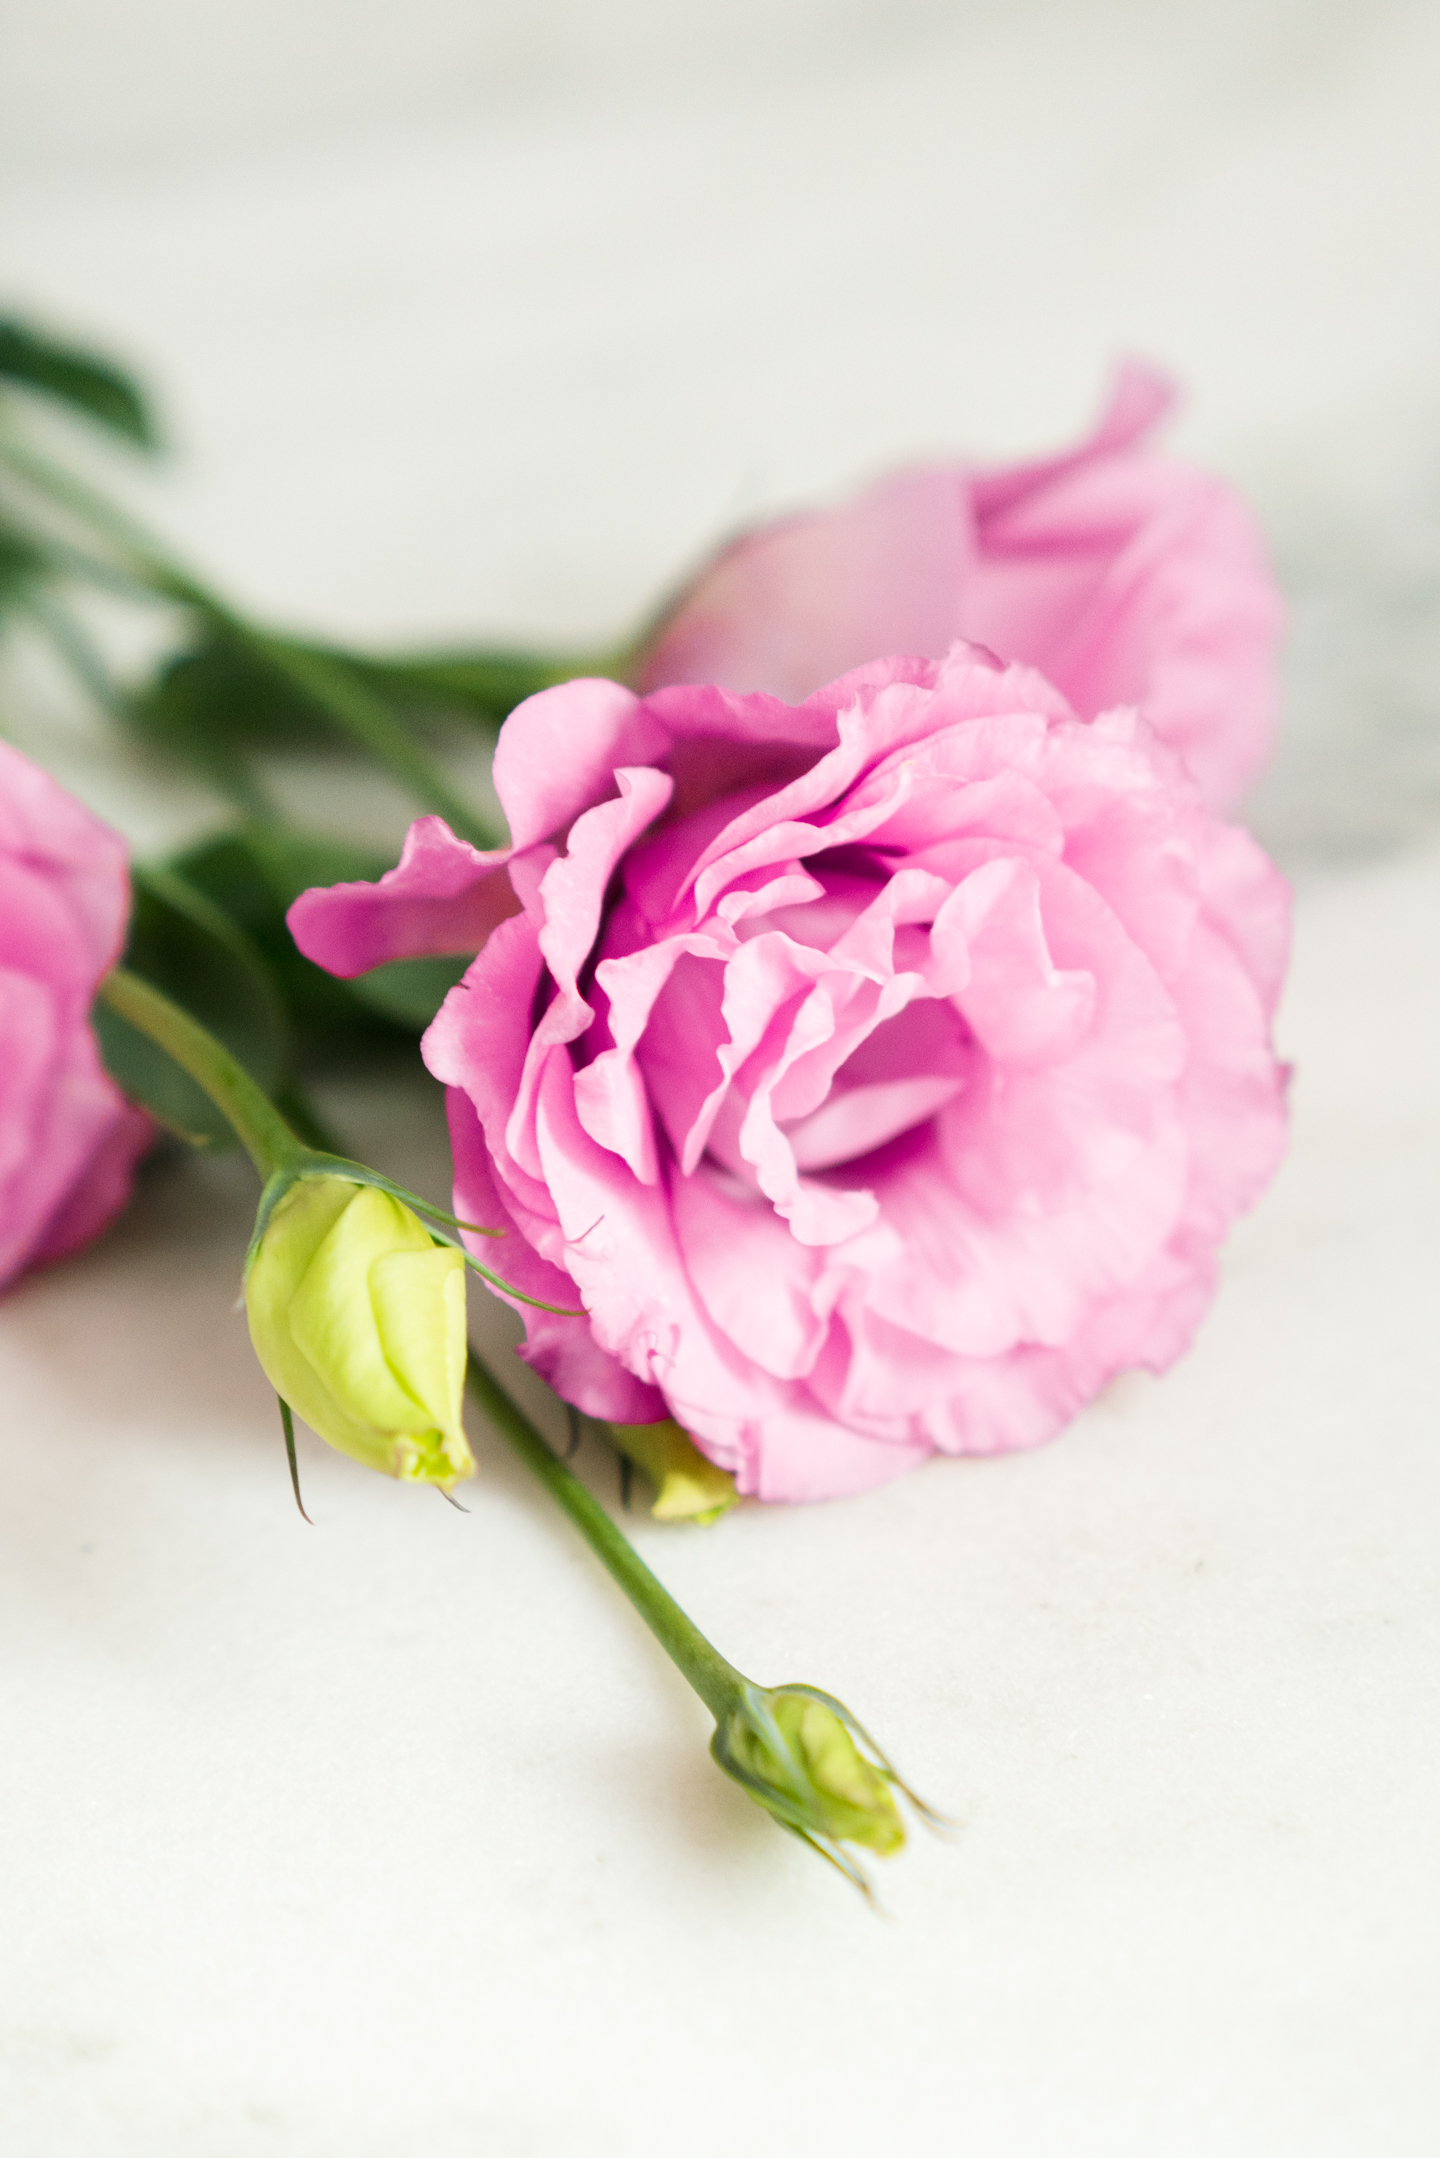 lizianthus flower